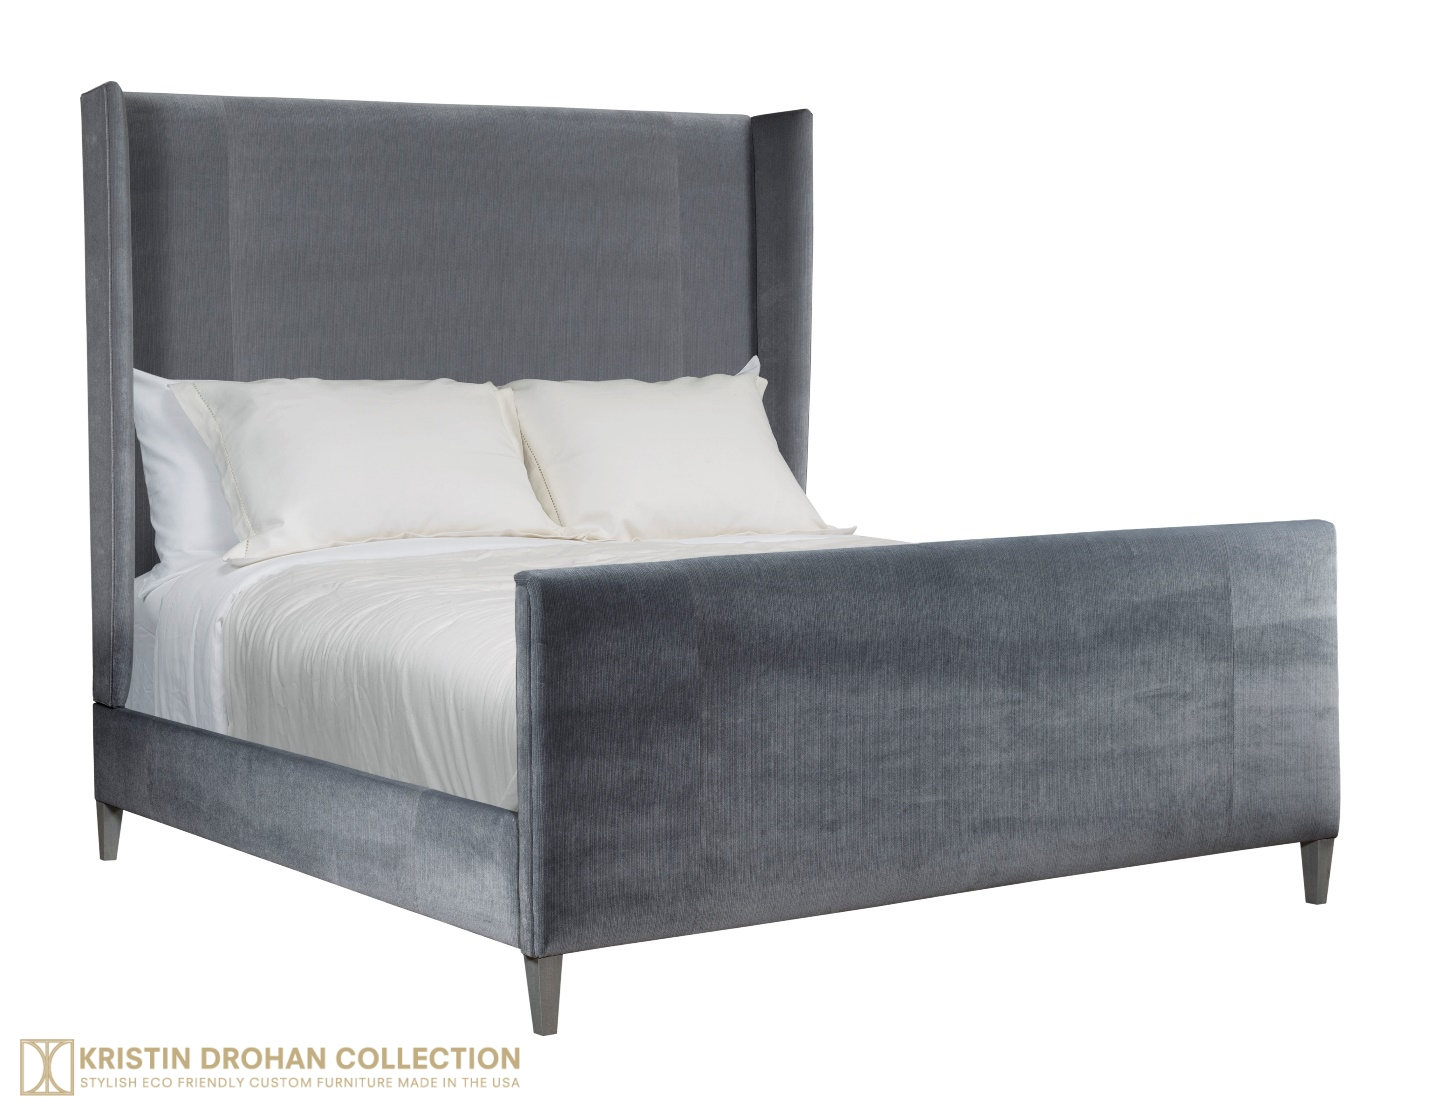 Destin Bed, Kristin Drohan Collection